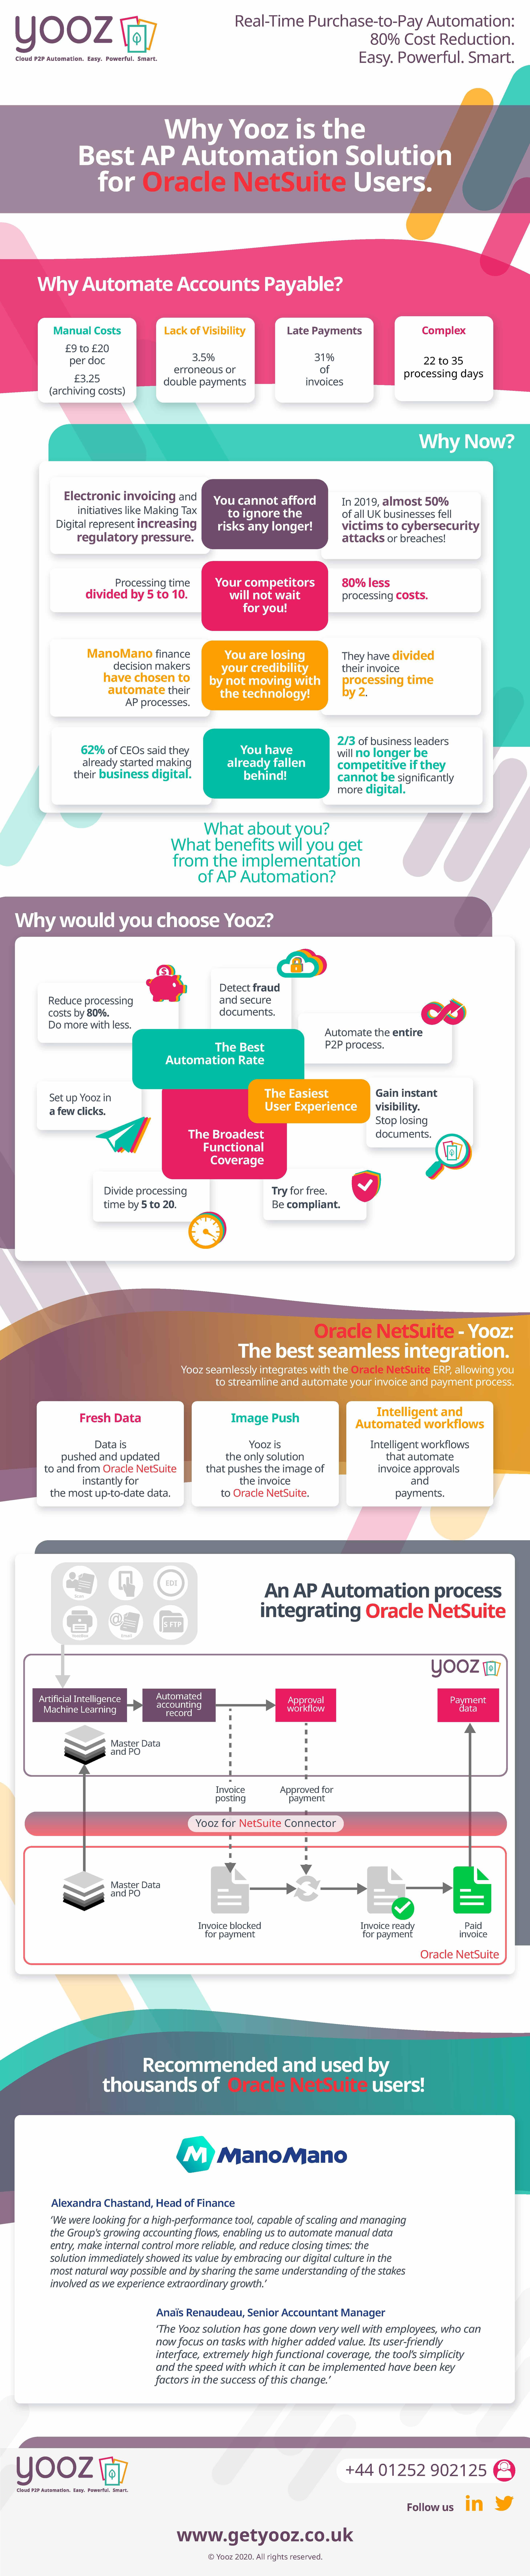 Yooz - Infographic - Oracle Netsuite - UK